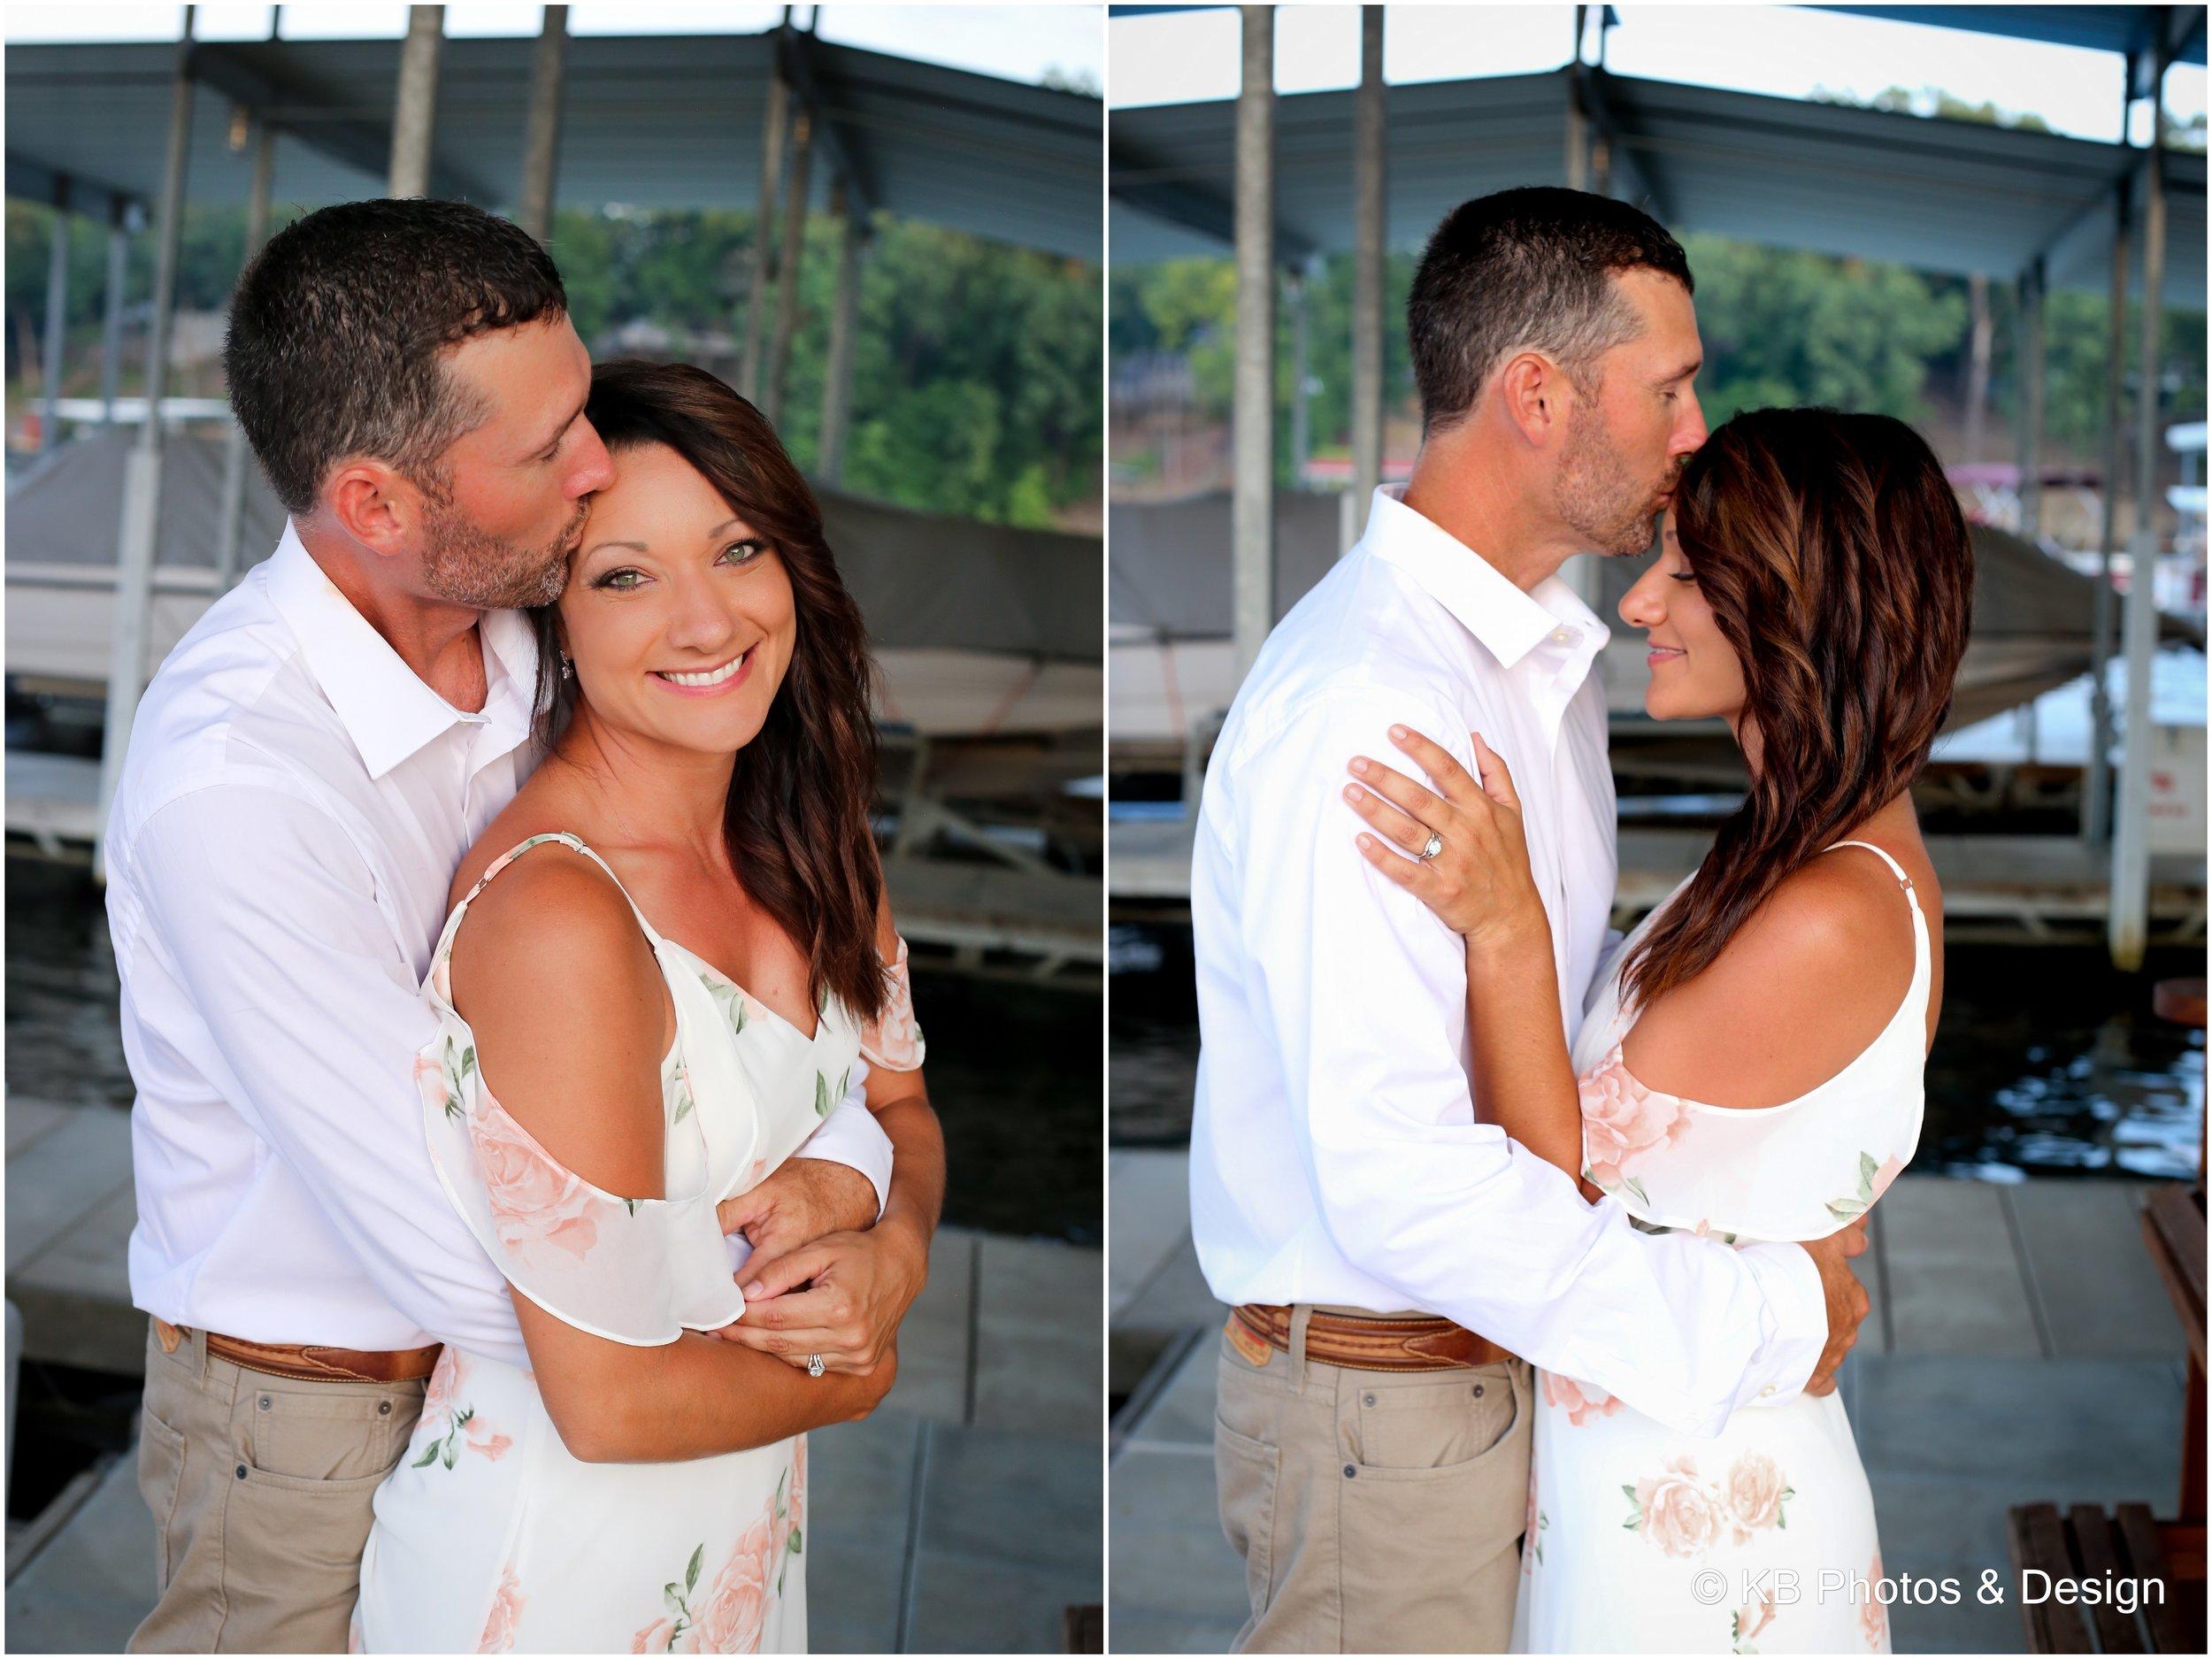 Jeff Kayla bride groom_KB Photos and Design 2.jpg